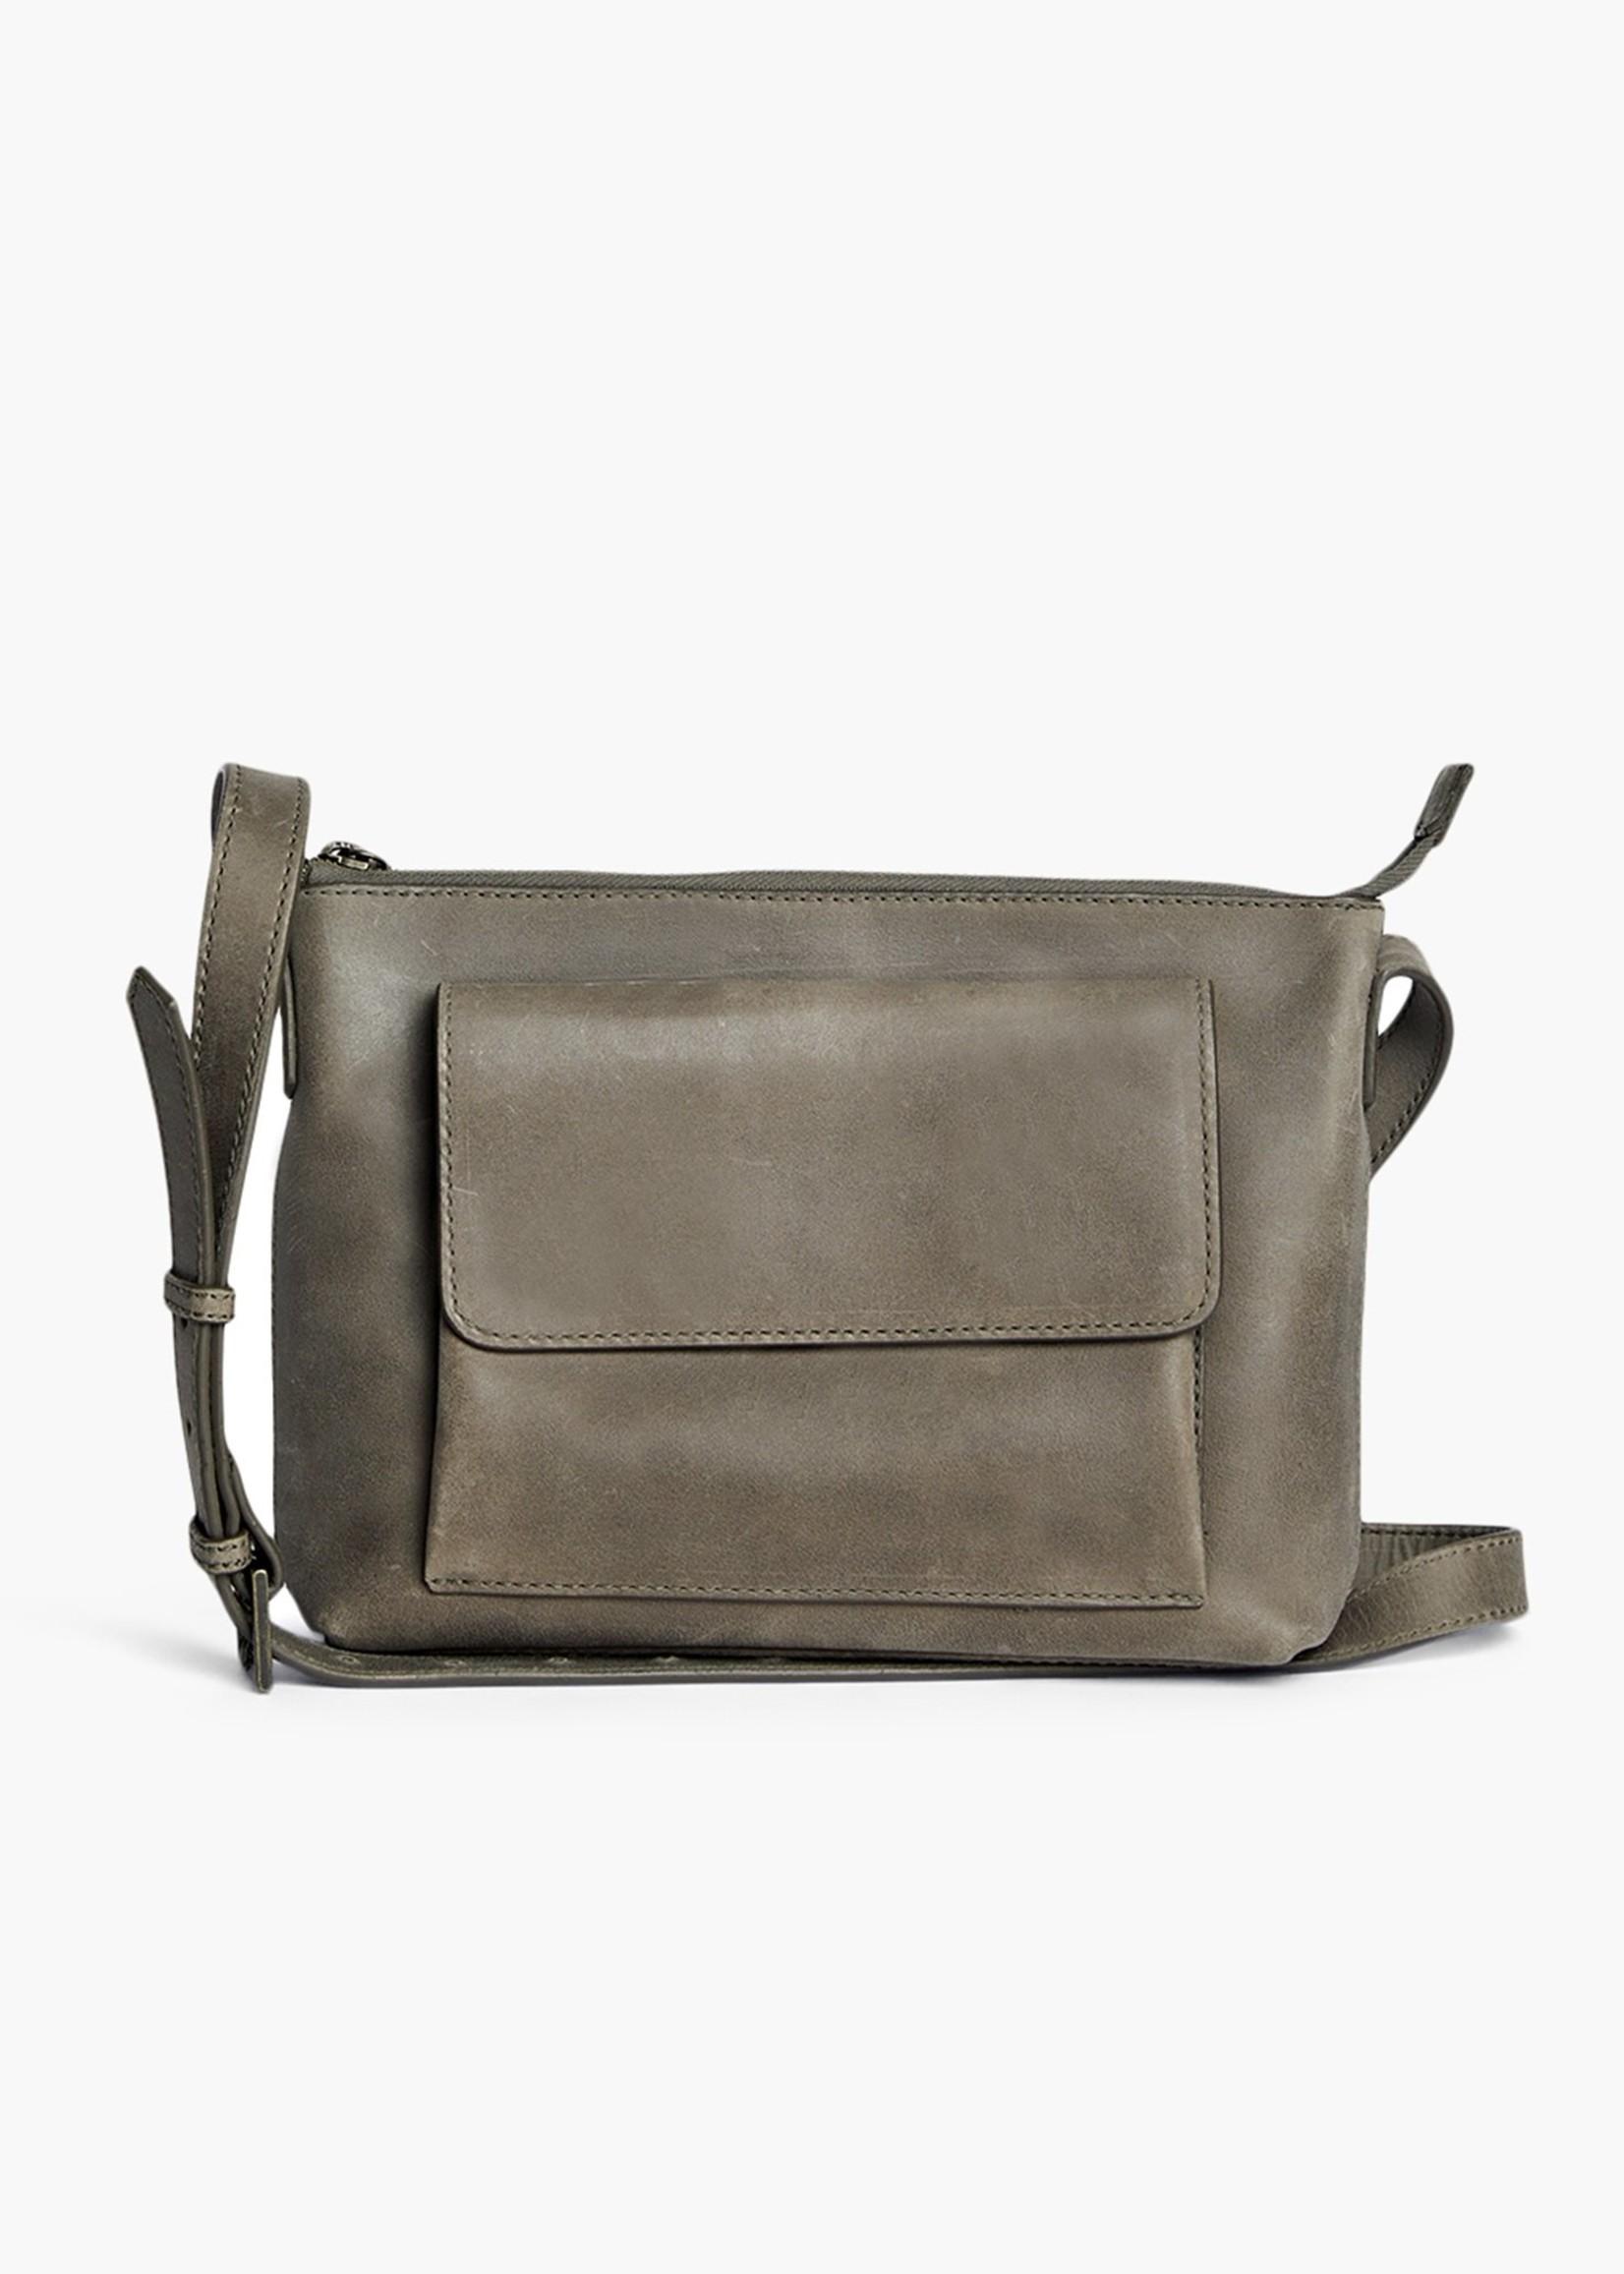 Able Leather Olivia Crossbody Leather Handbag